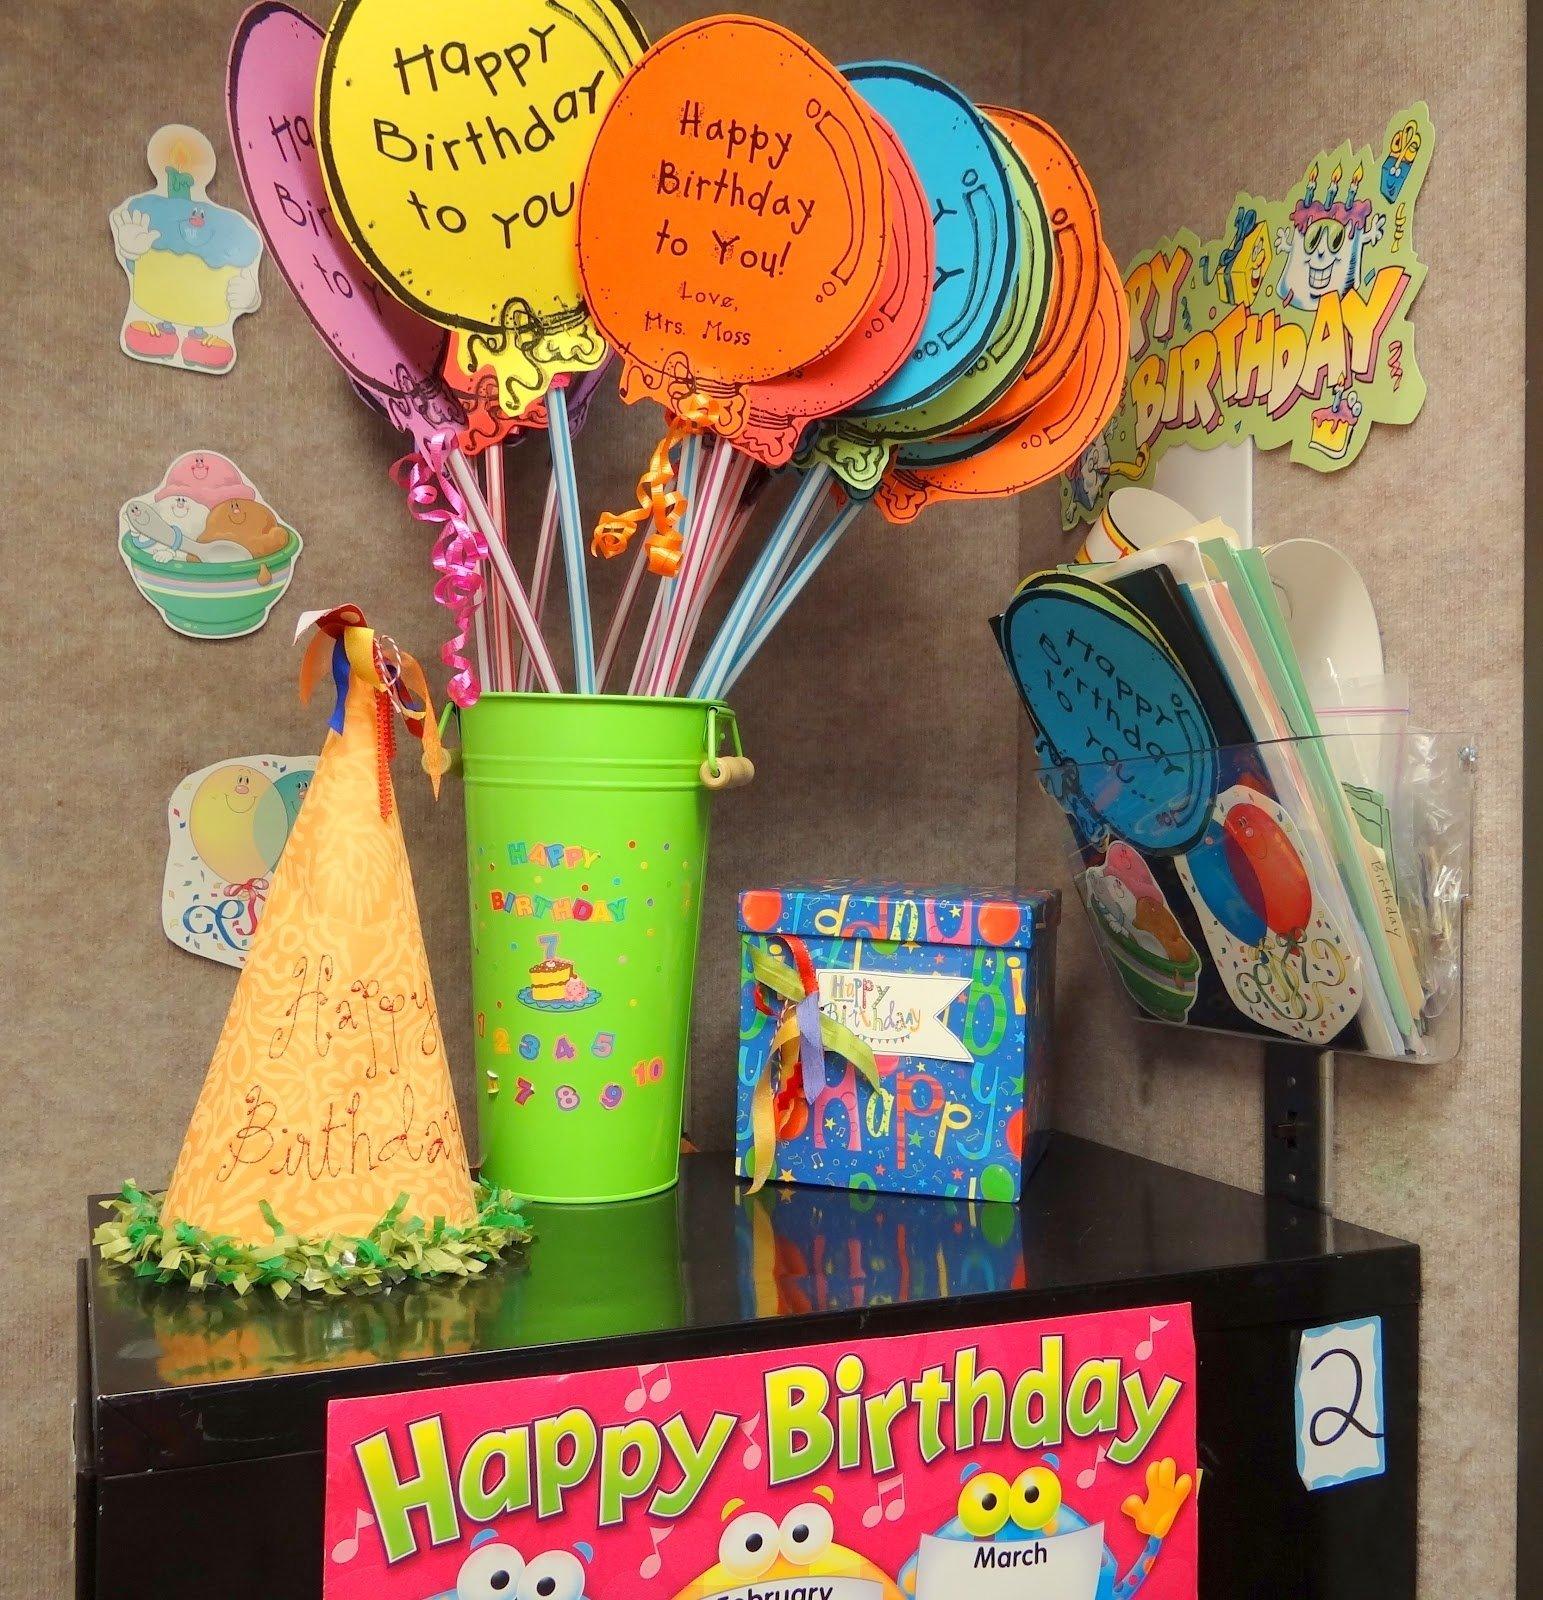 10 Amazing Birthday Ideas For A Friend creative birthday ideas for your best friend life realities